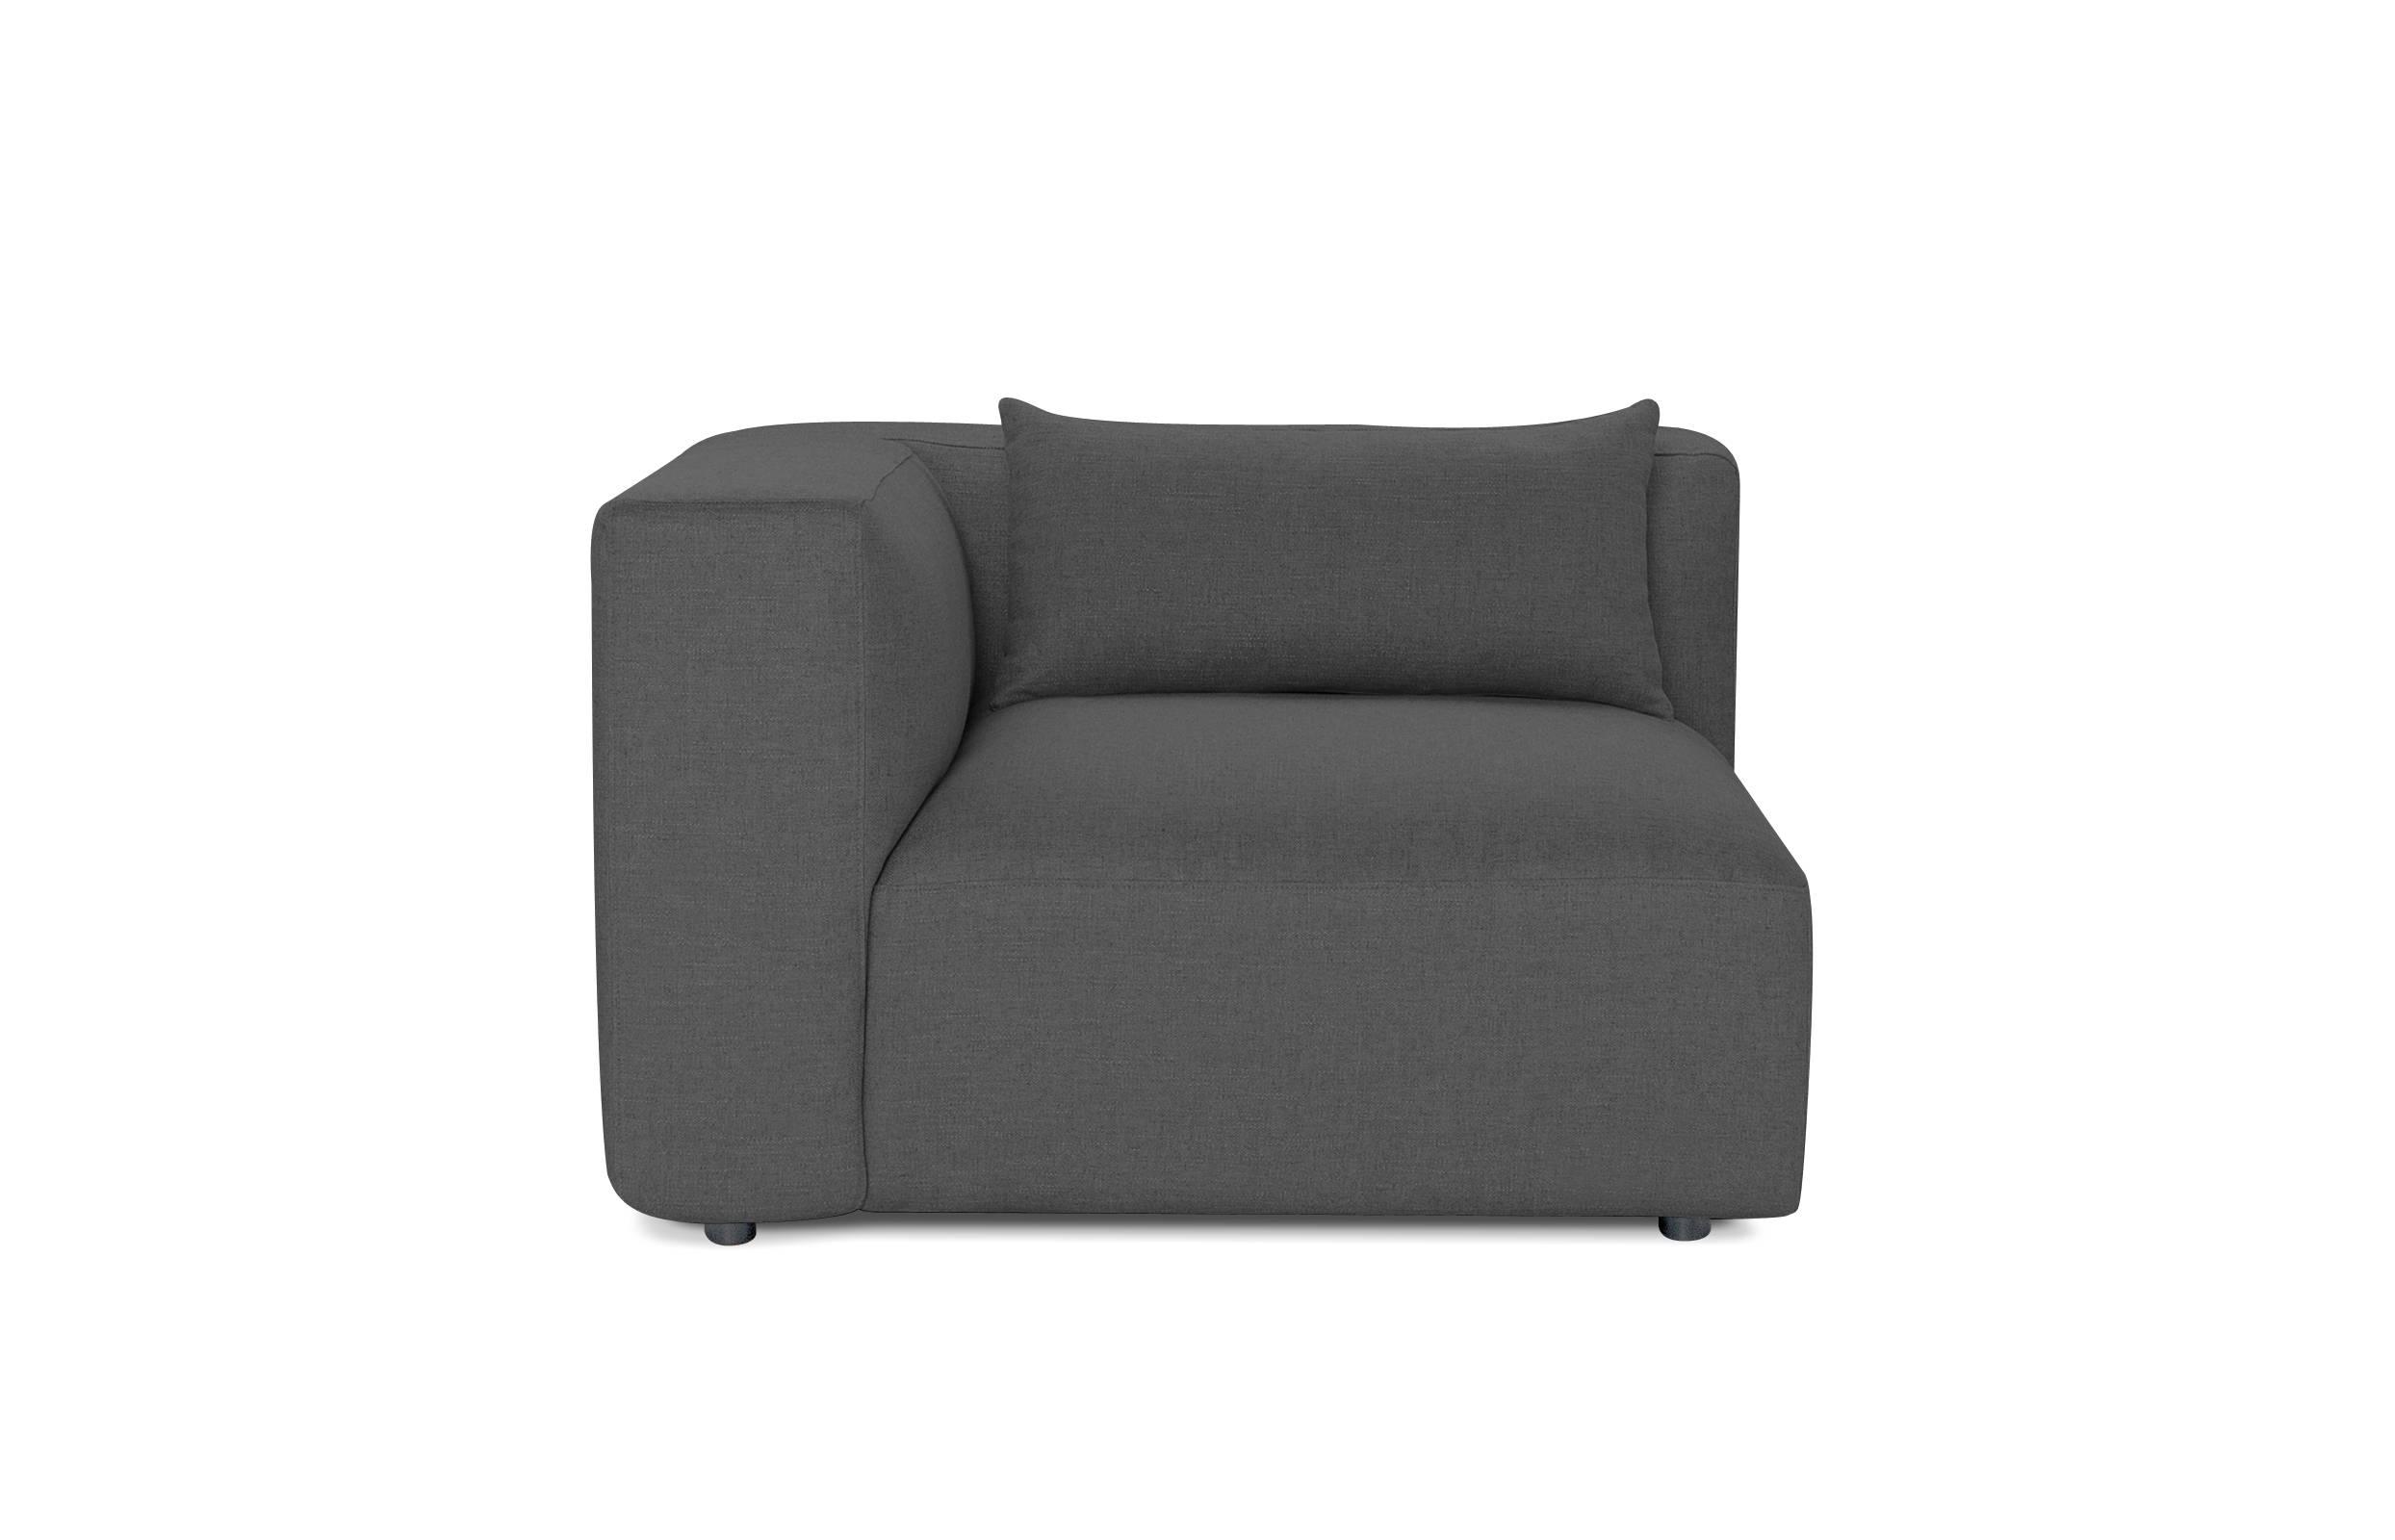 Full Size of Natura Sofa Newport Kaufen Brooklyn Gebraucht Denver Home Couch Kansas Pasadena Modulsofa Fofo Sitzfeldtcom Mit Relaxfunktion 3 Sitzer Elektrisch Affaire Big Sofa Natura Sofa